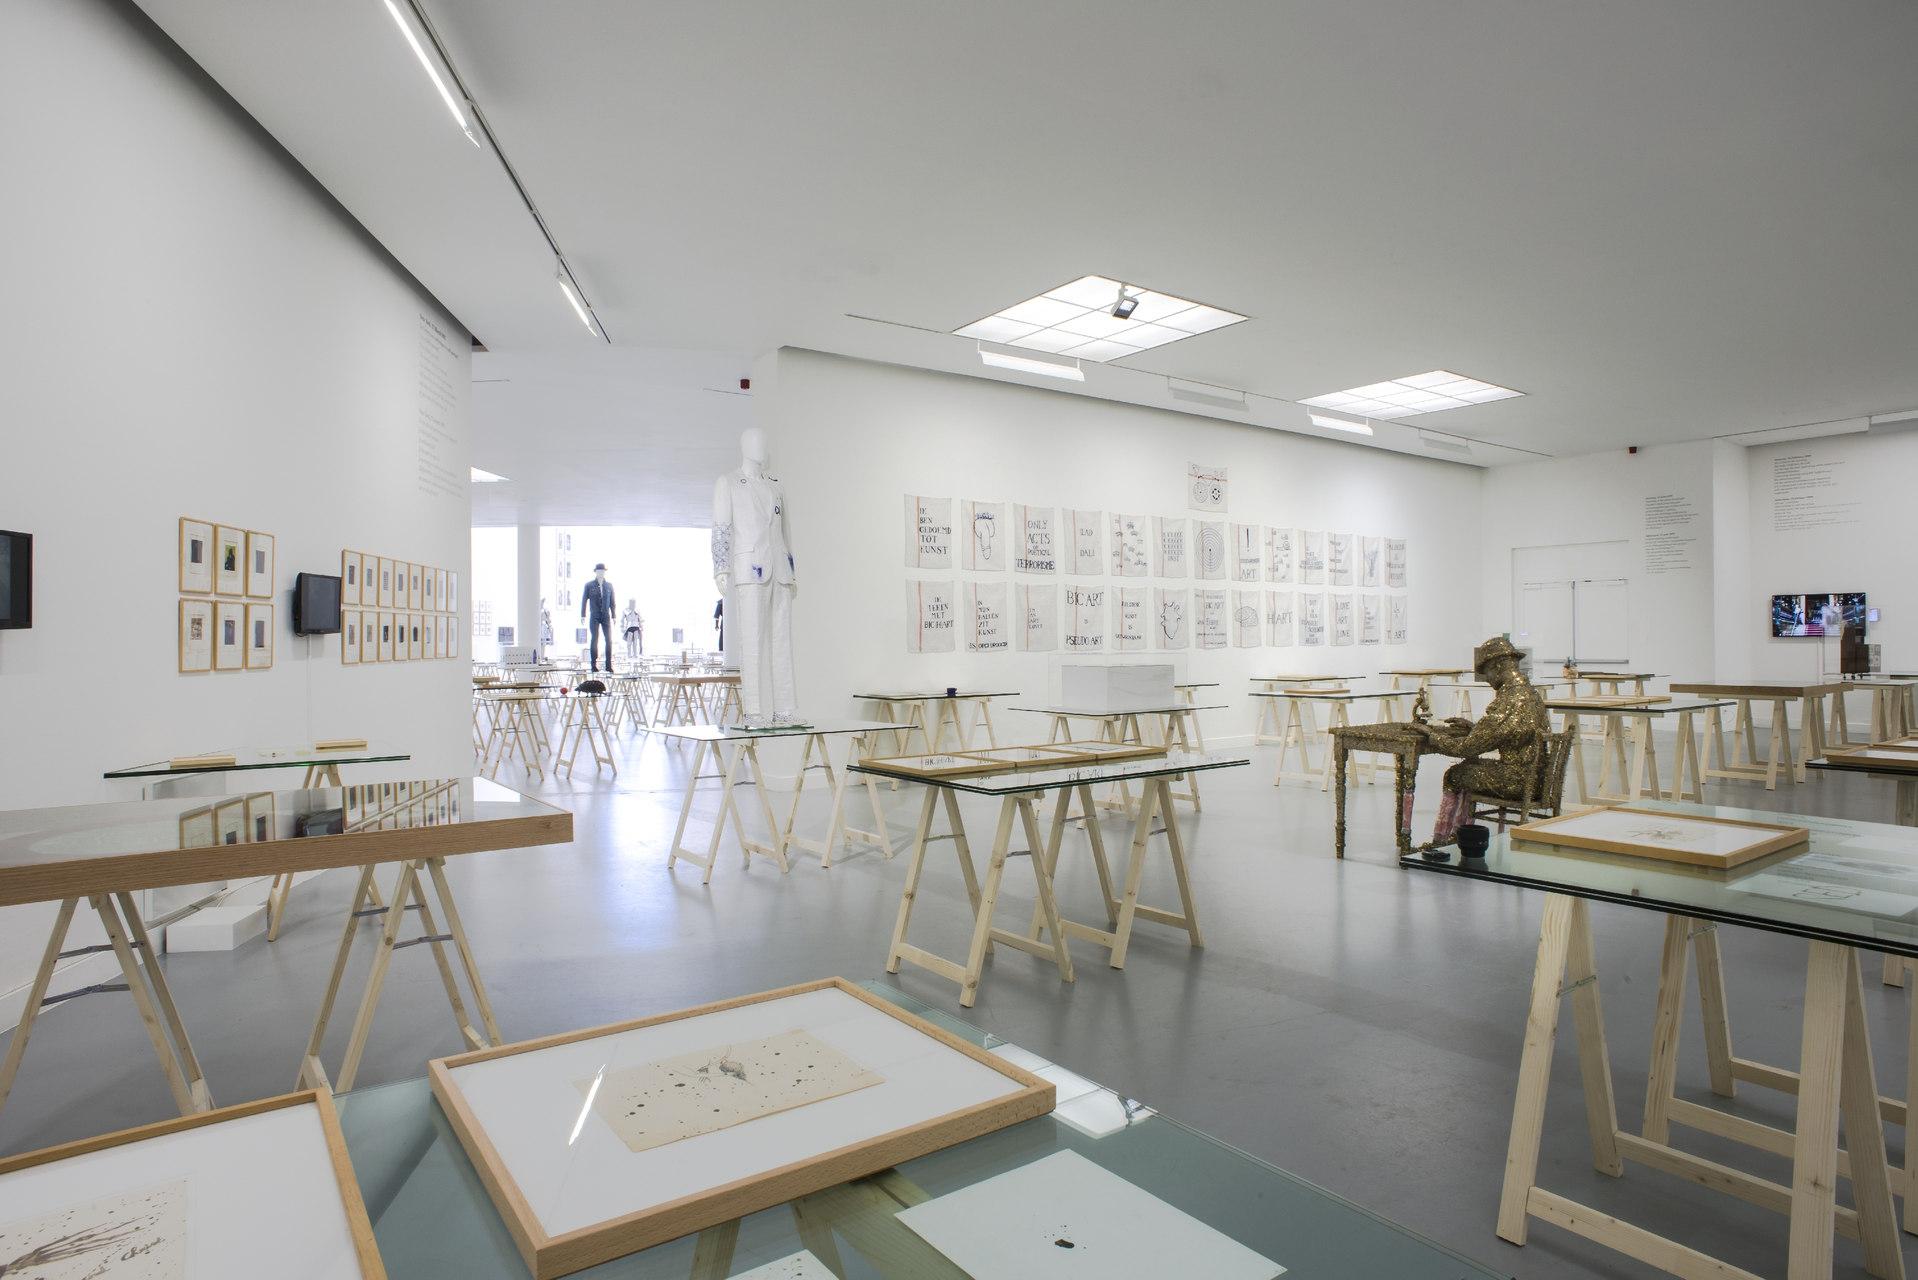 Jan_Fabre,_exhibition_view_M_HKA_2015_photo_M_HKAclinckx25